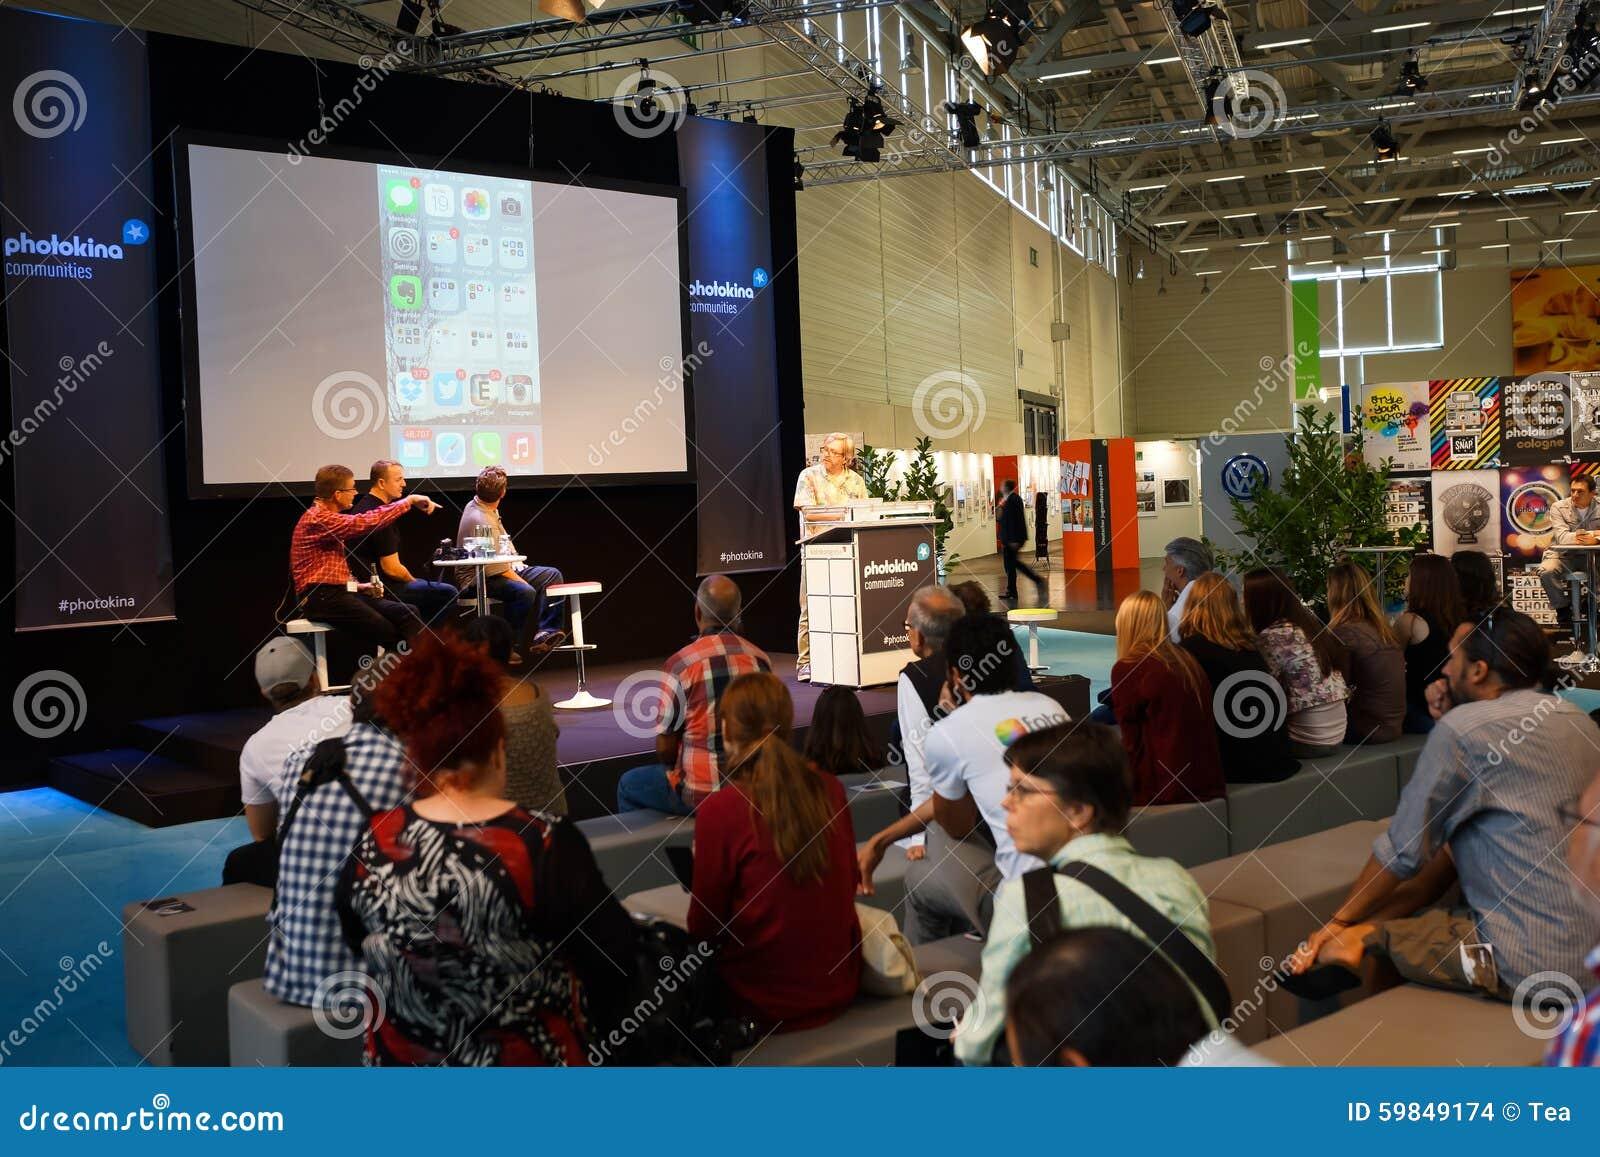 Photokina Exhibition Interior Editorial Stock Image